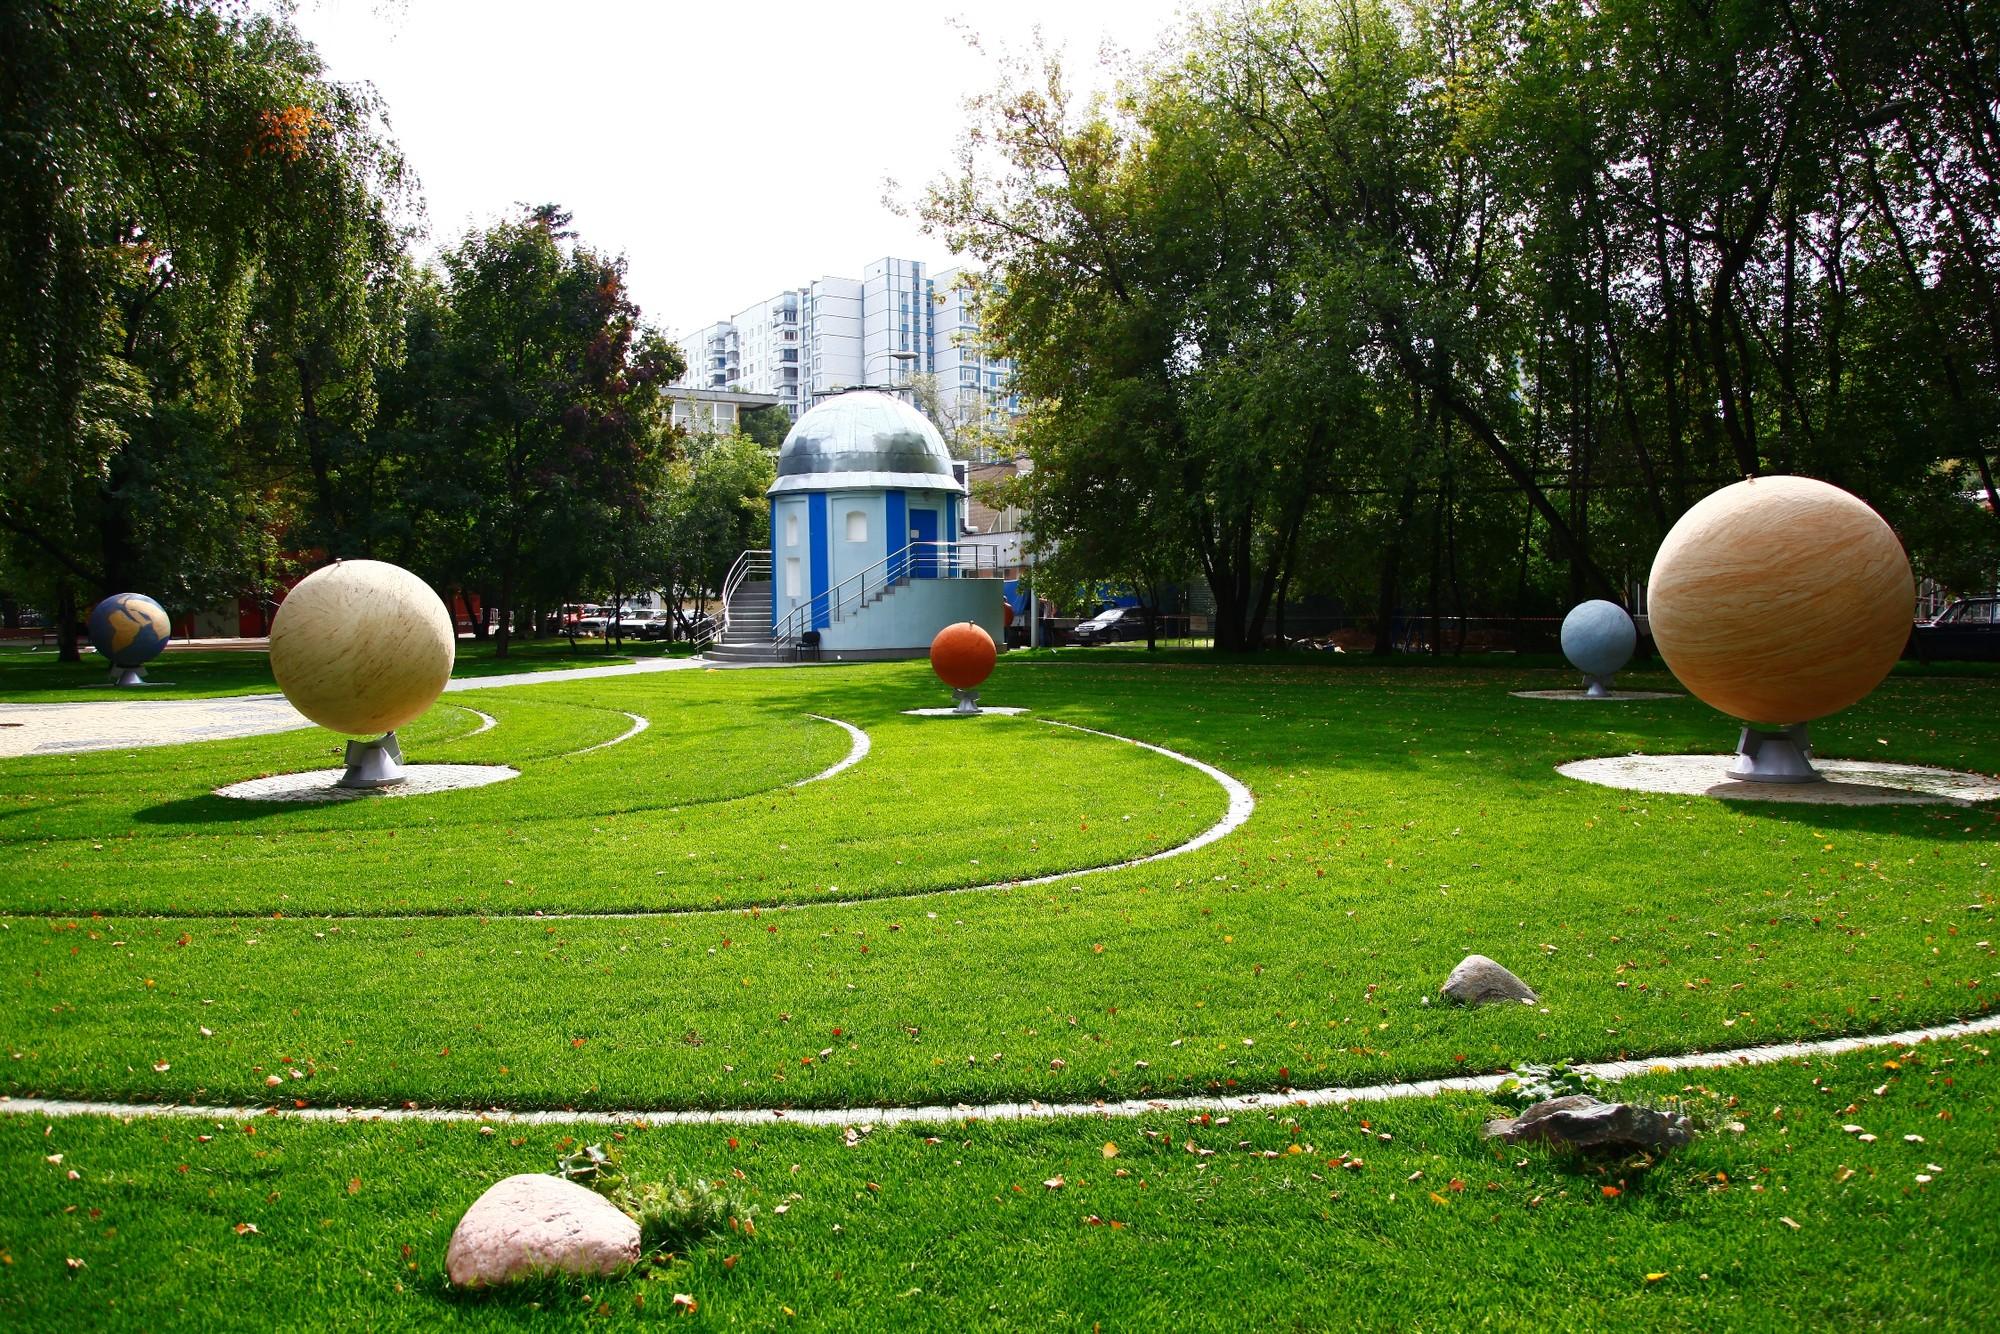 Conceptual Framework for the Development of Sokolniki Park Competition, Sokolniki Park